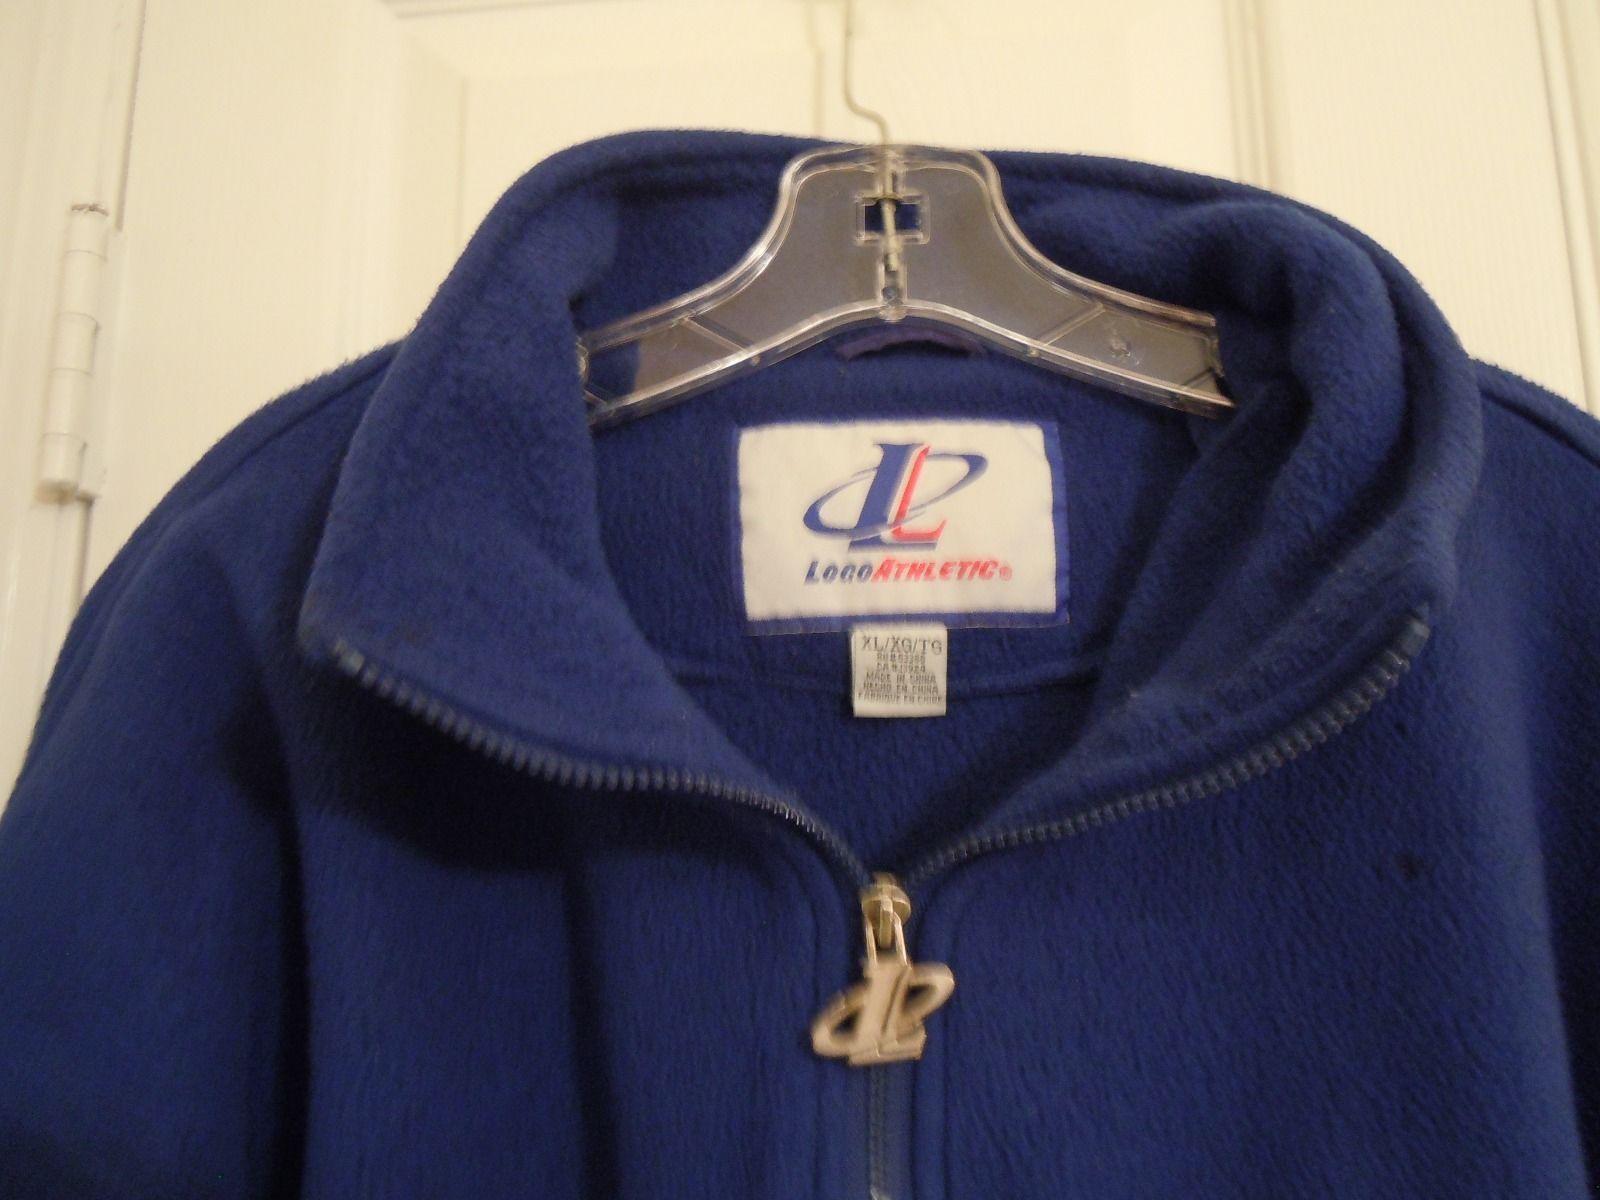 LOGO ATHLETIC Mens XL Blue Zipperneck Pullover SWEATSHIRT 100% Polyester  NICE !